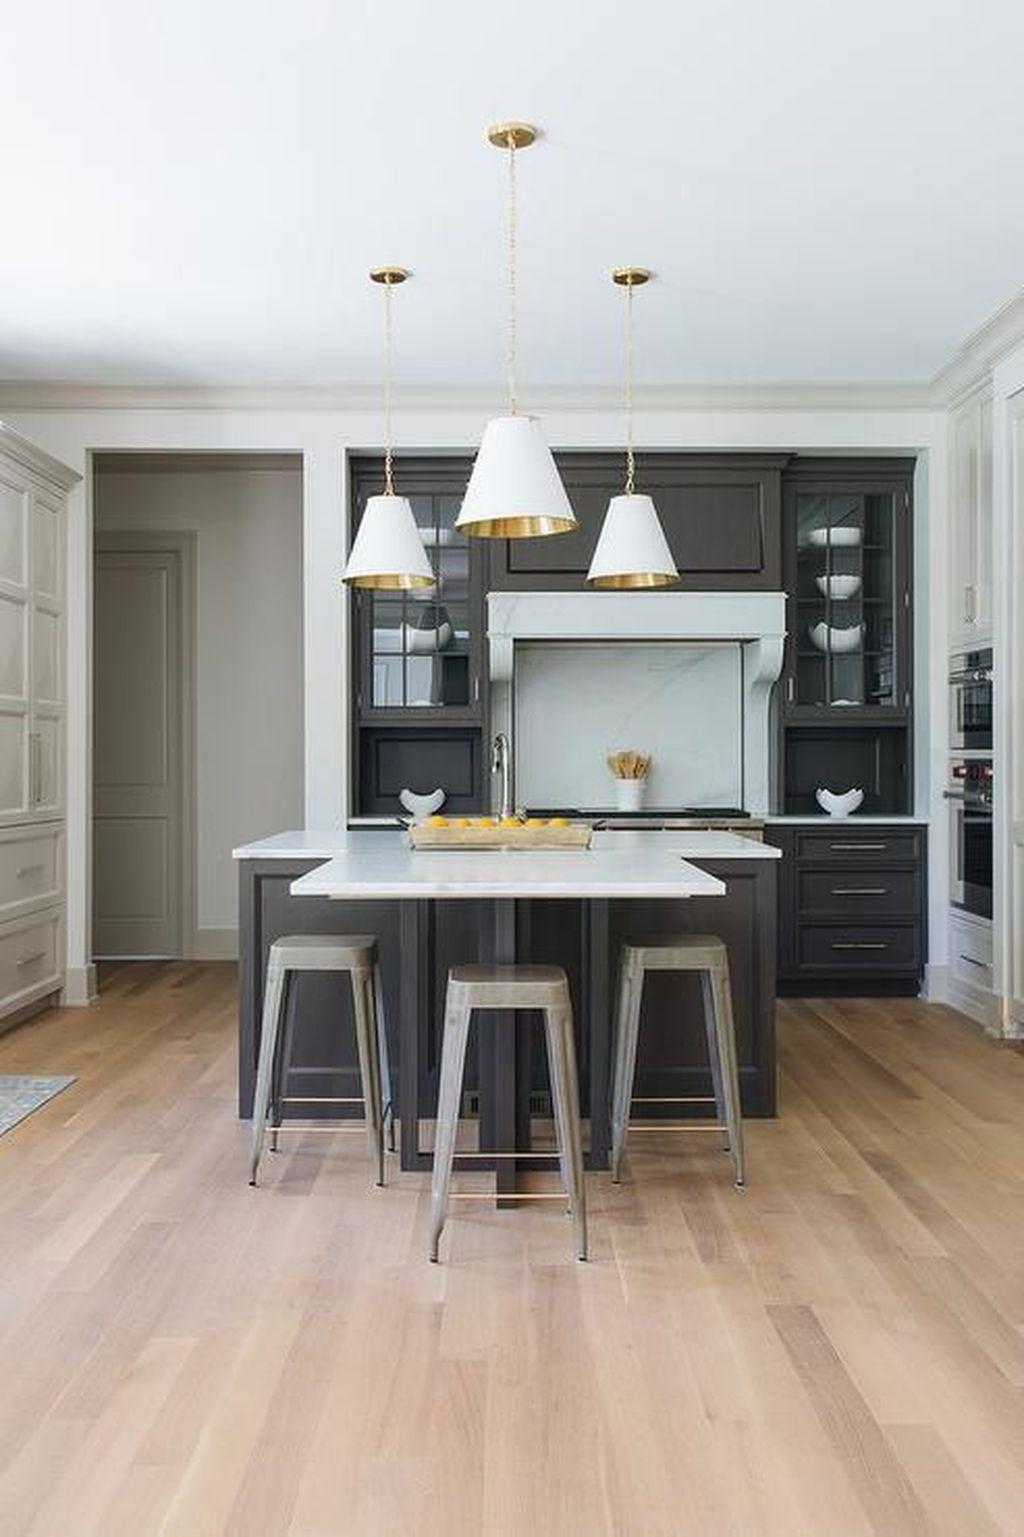 33 Amazing u Shaped Kitchen Design Ideas You Should Copy ...